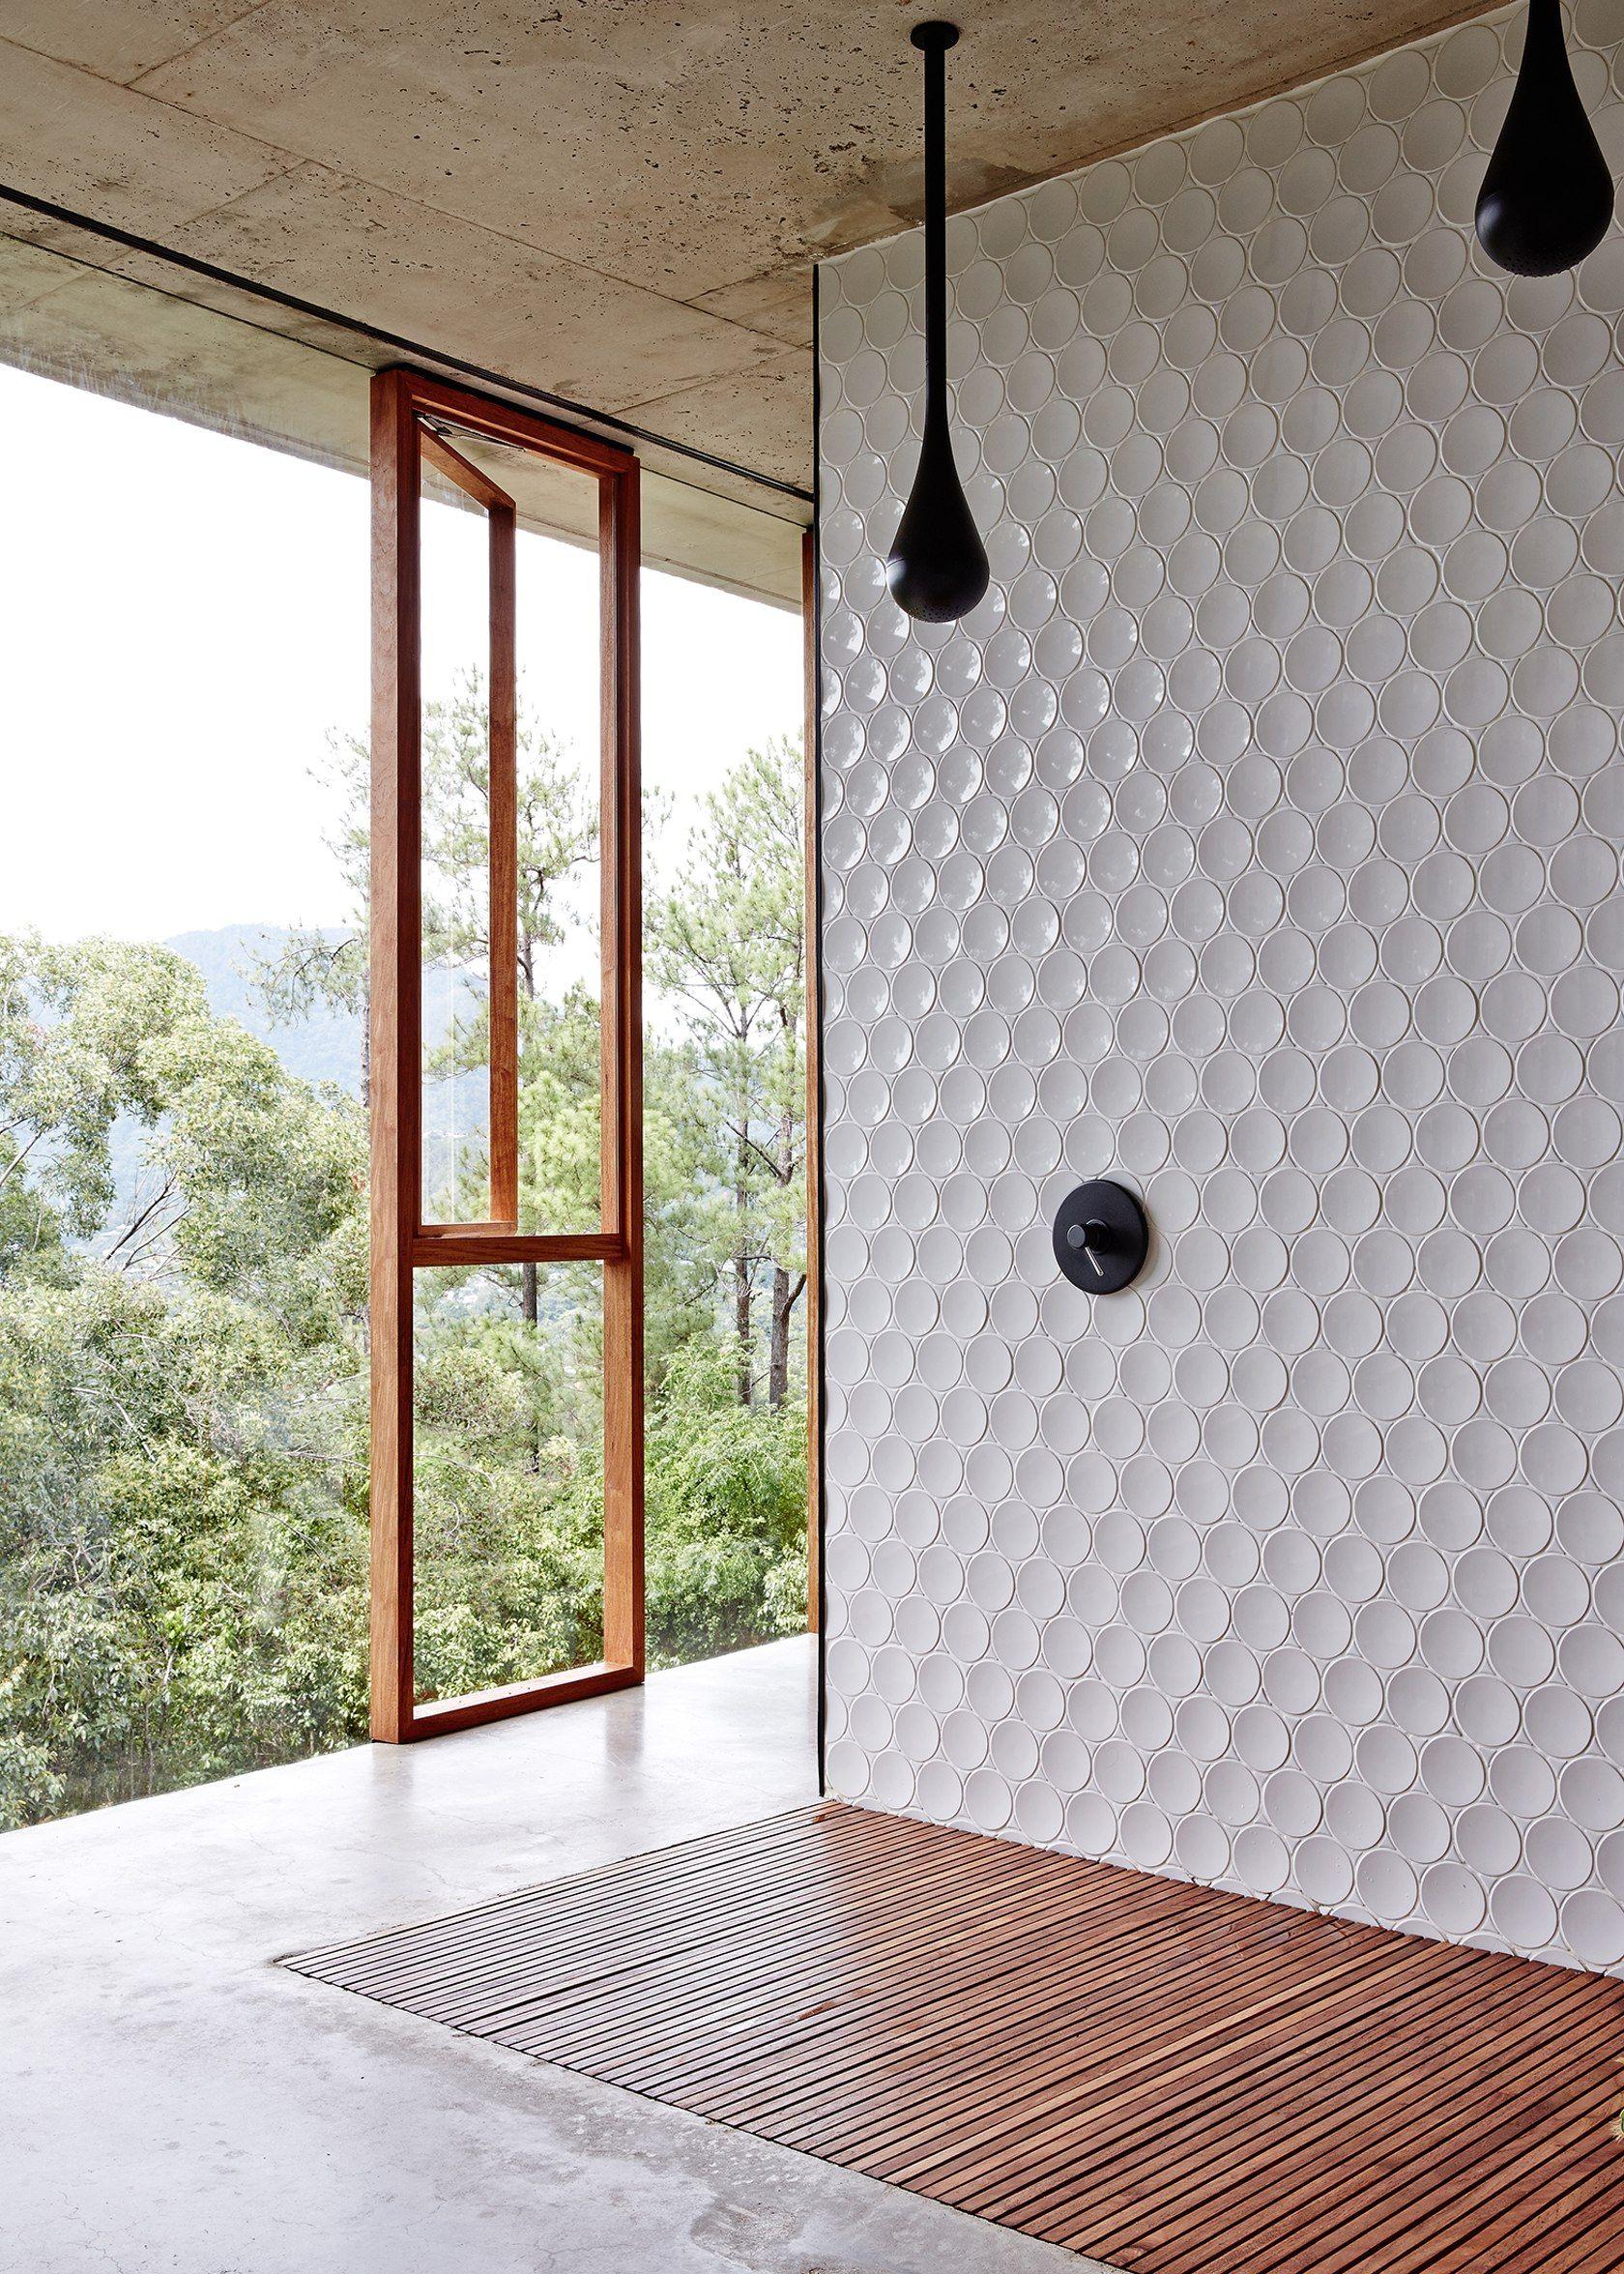 Bathroom Tile Idea Install Tiles To